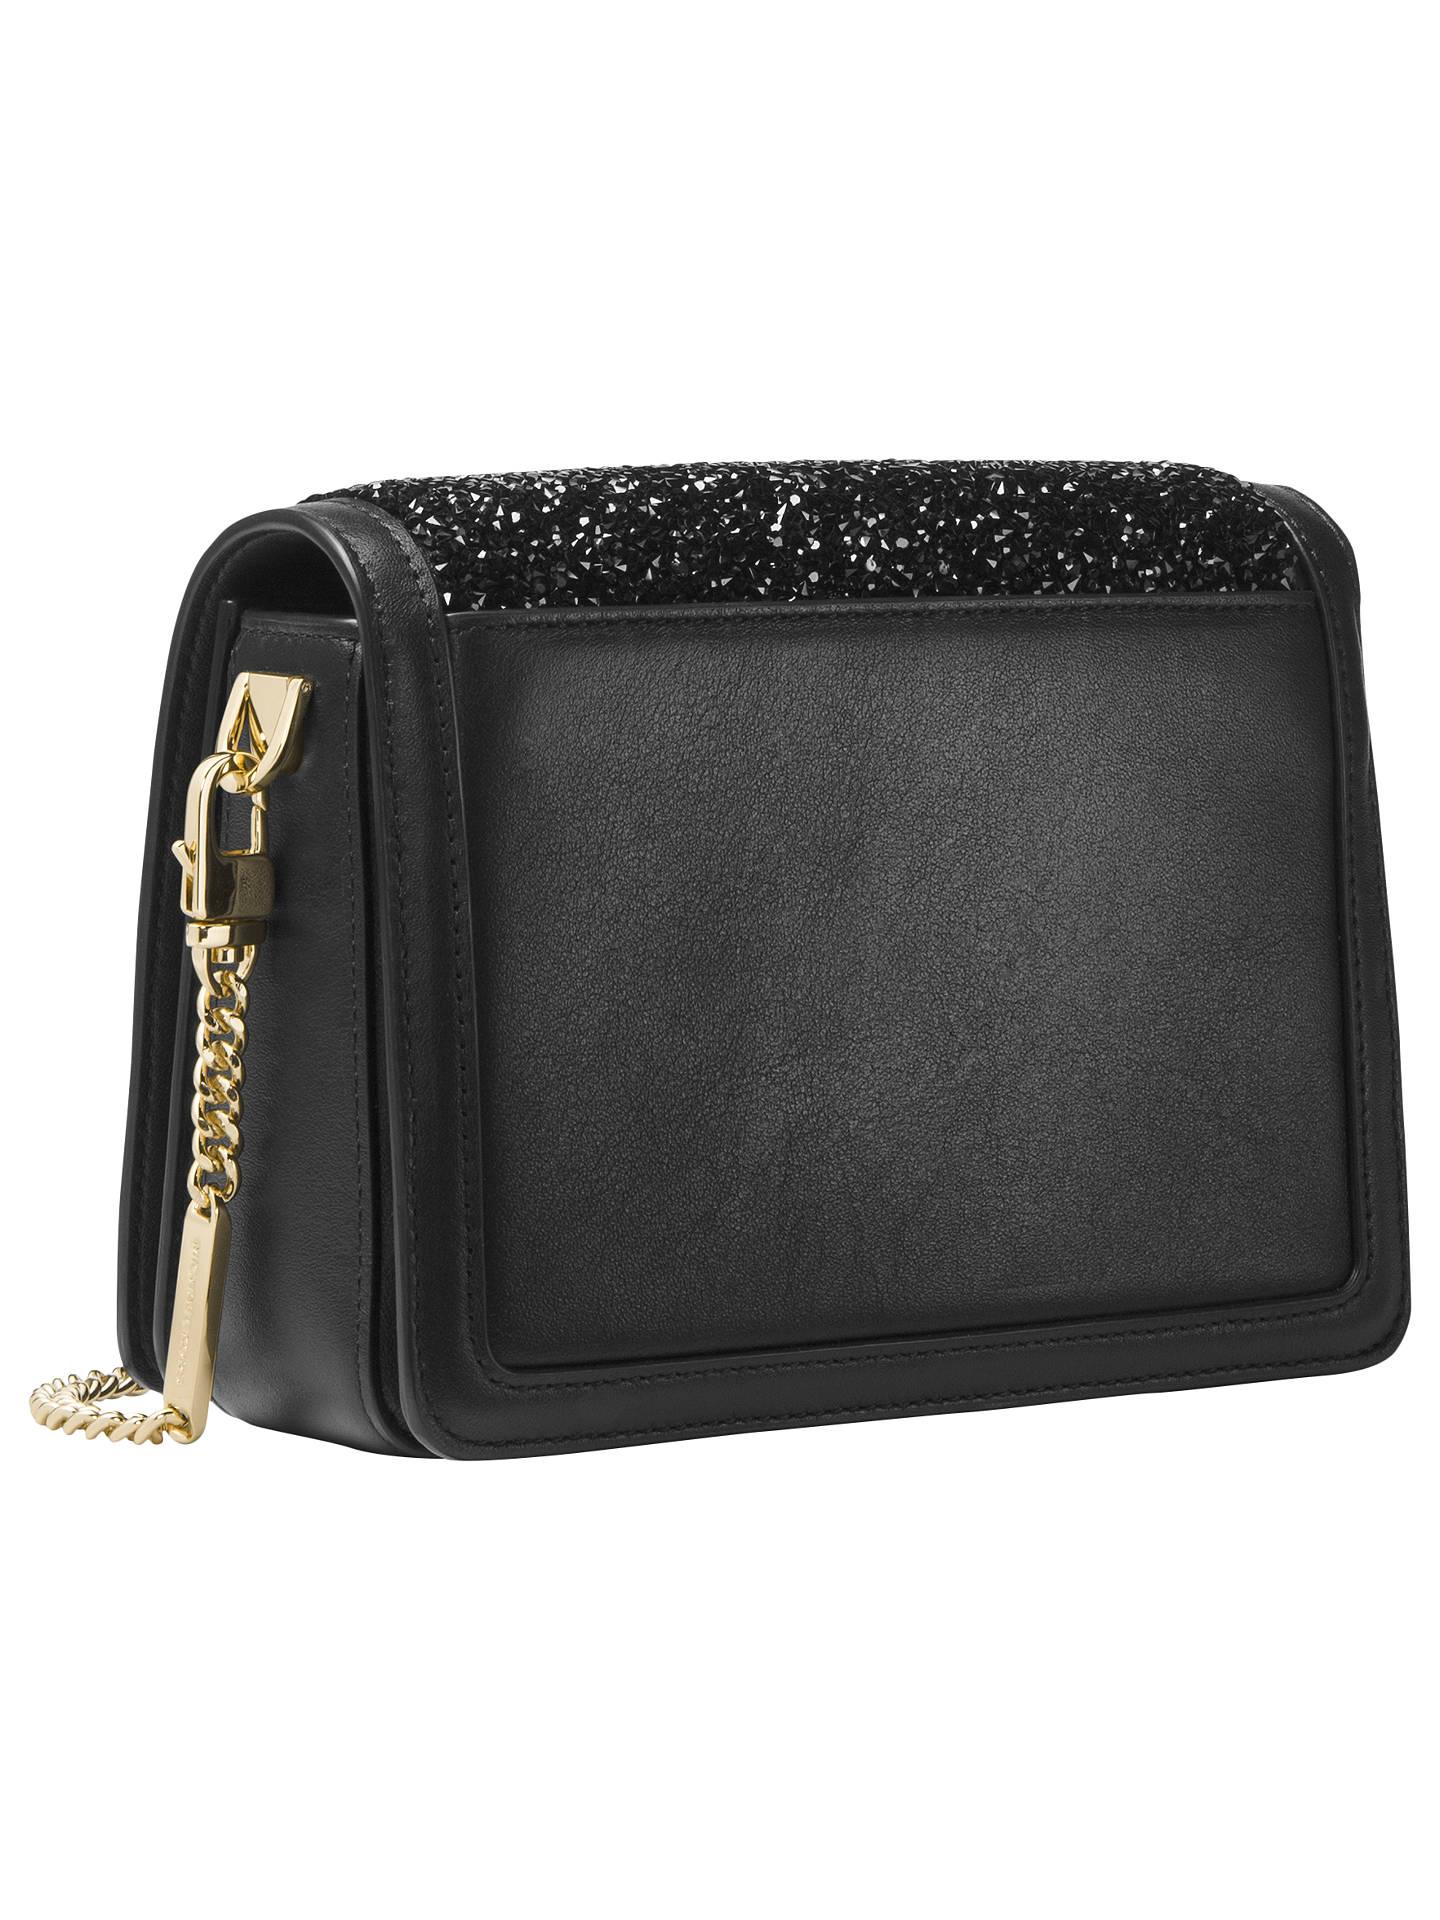 c22768165cc70 ... Buy MICHAEL Michael Kors Jade Beaded Clutch Bag